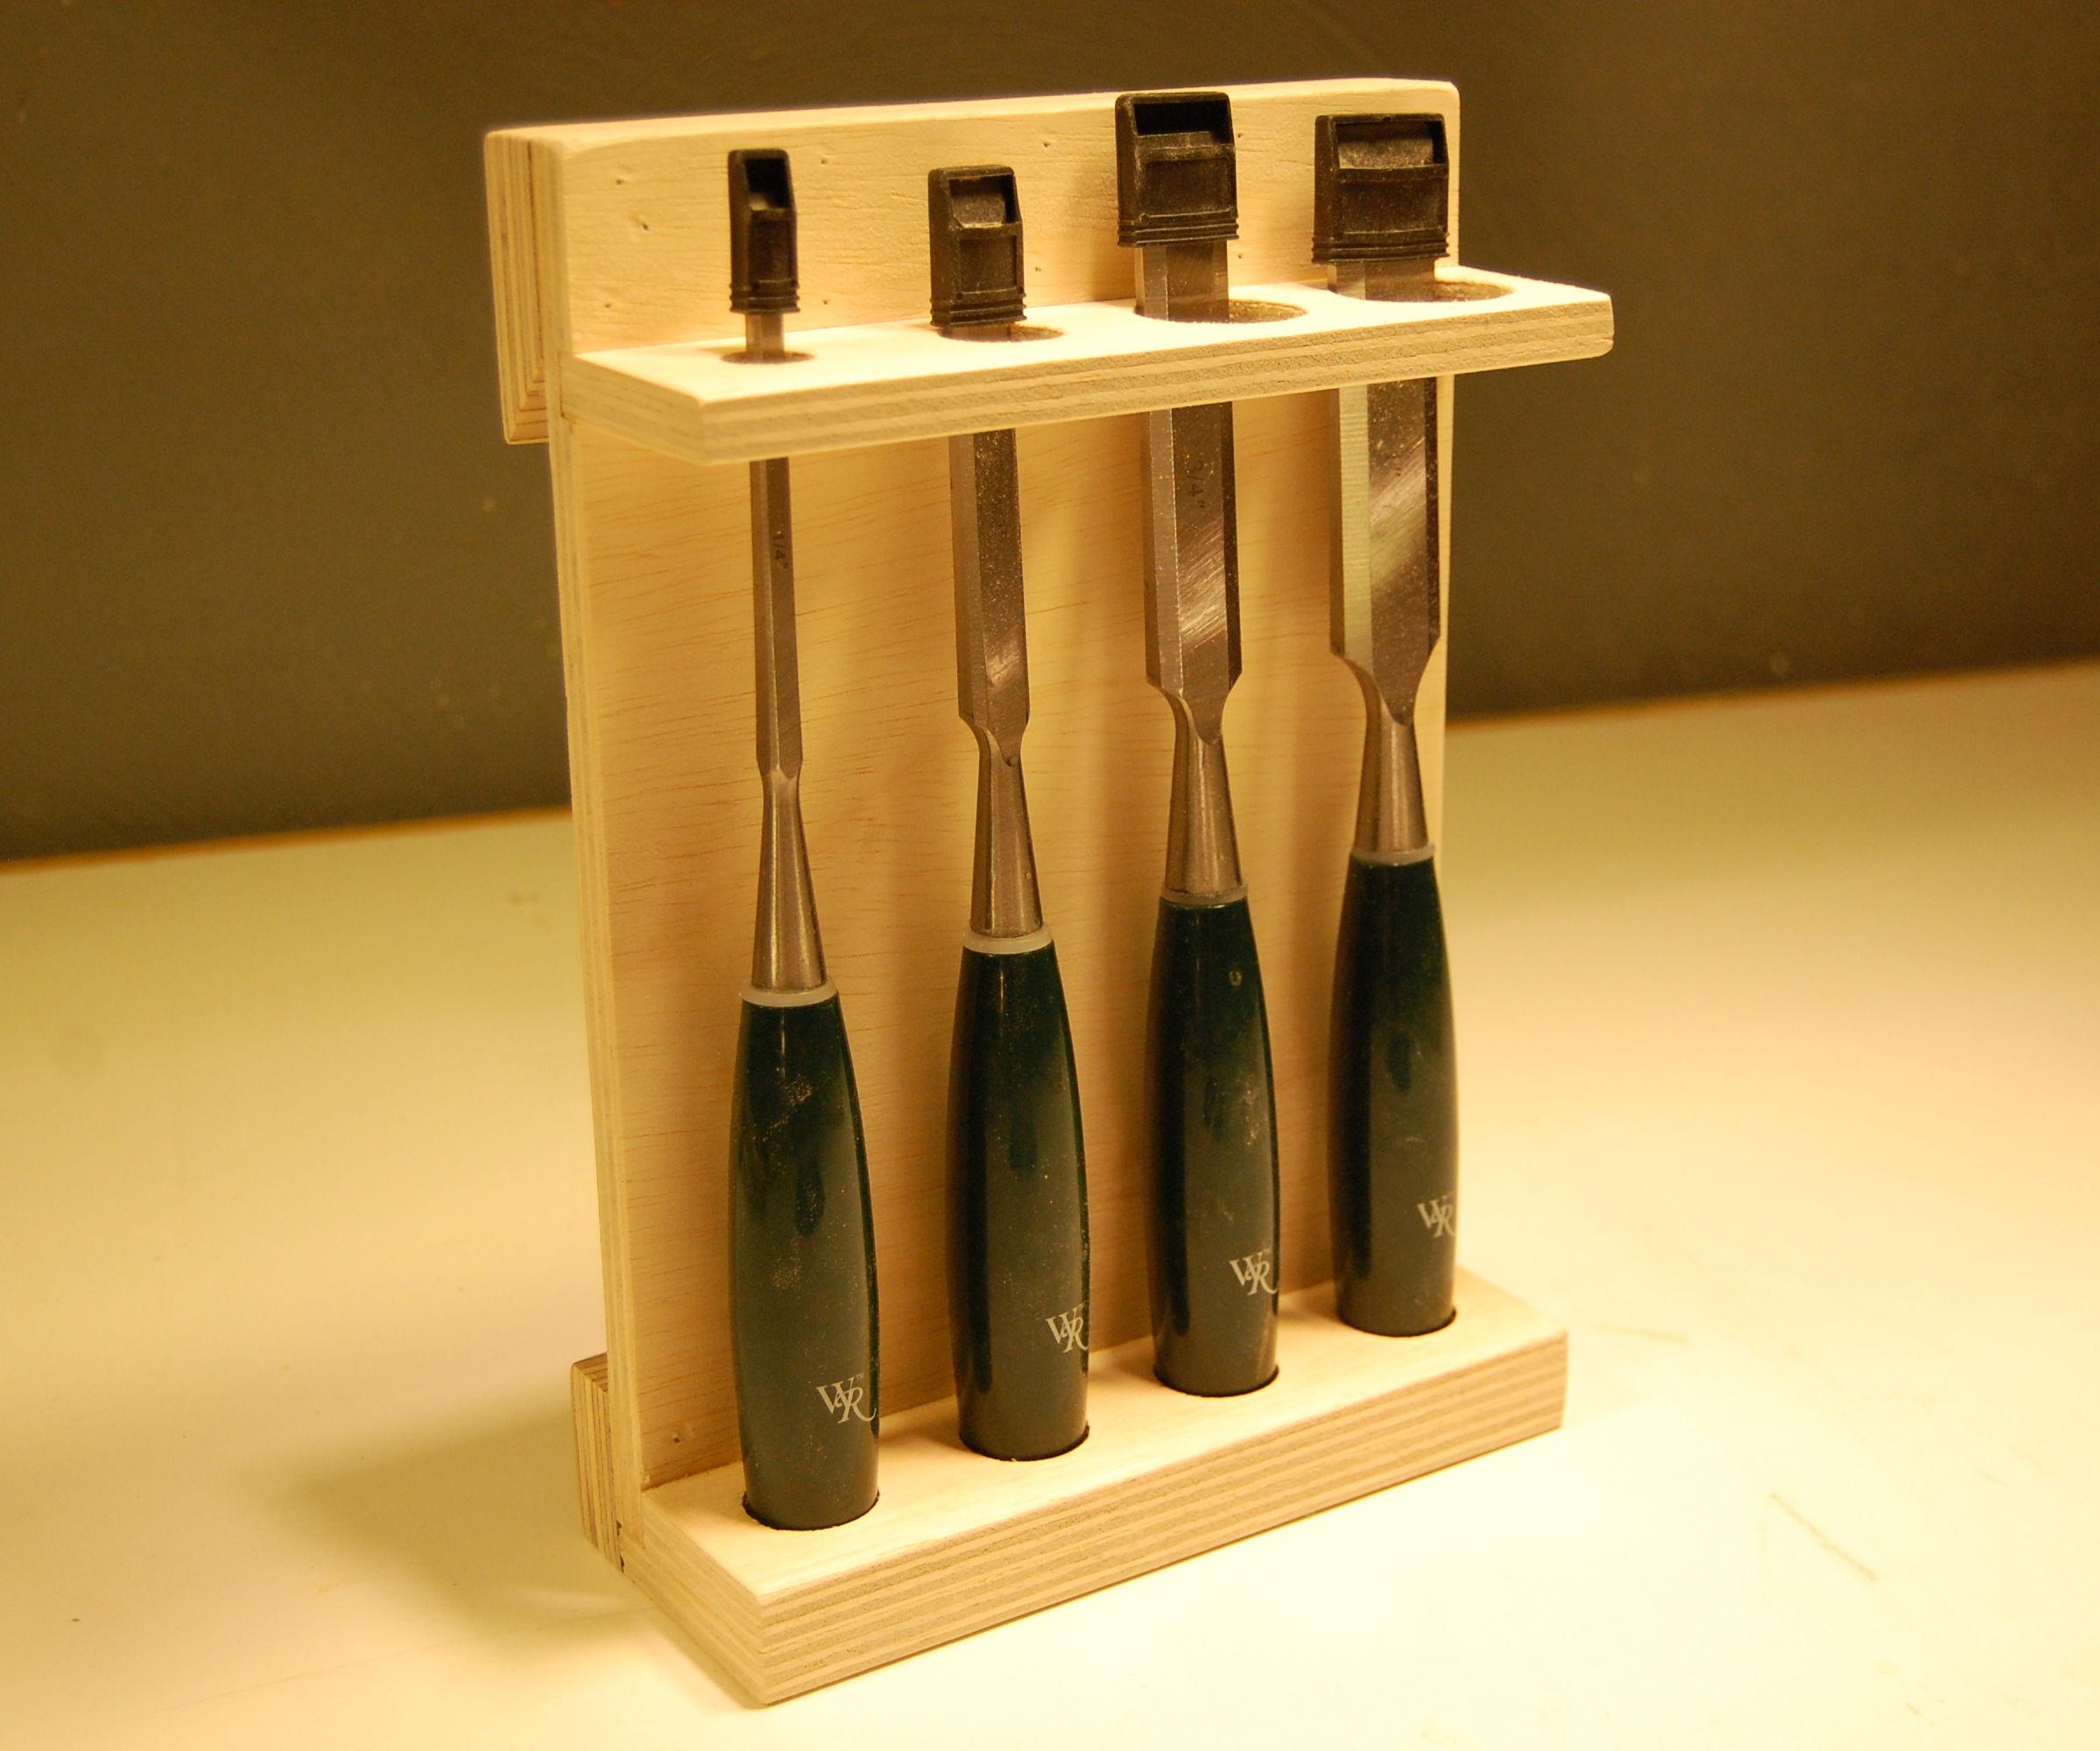 The Chisel Storage Rack